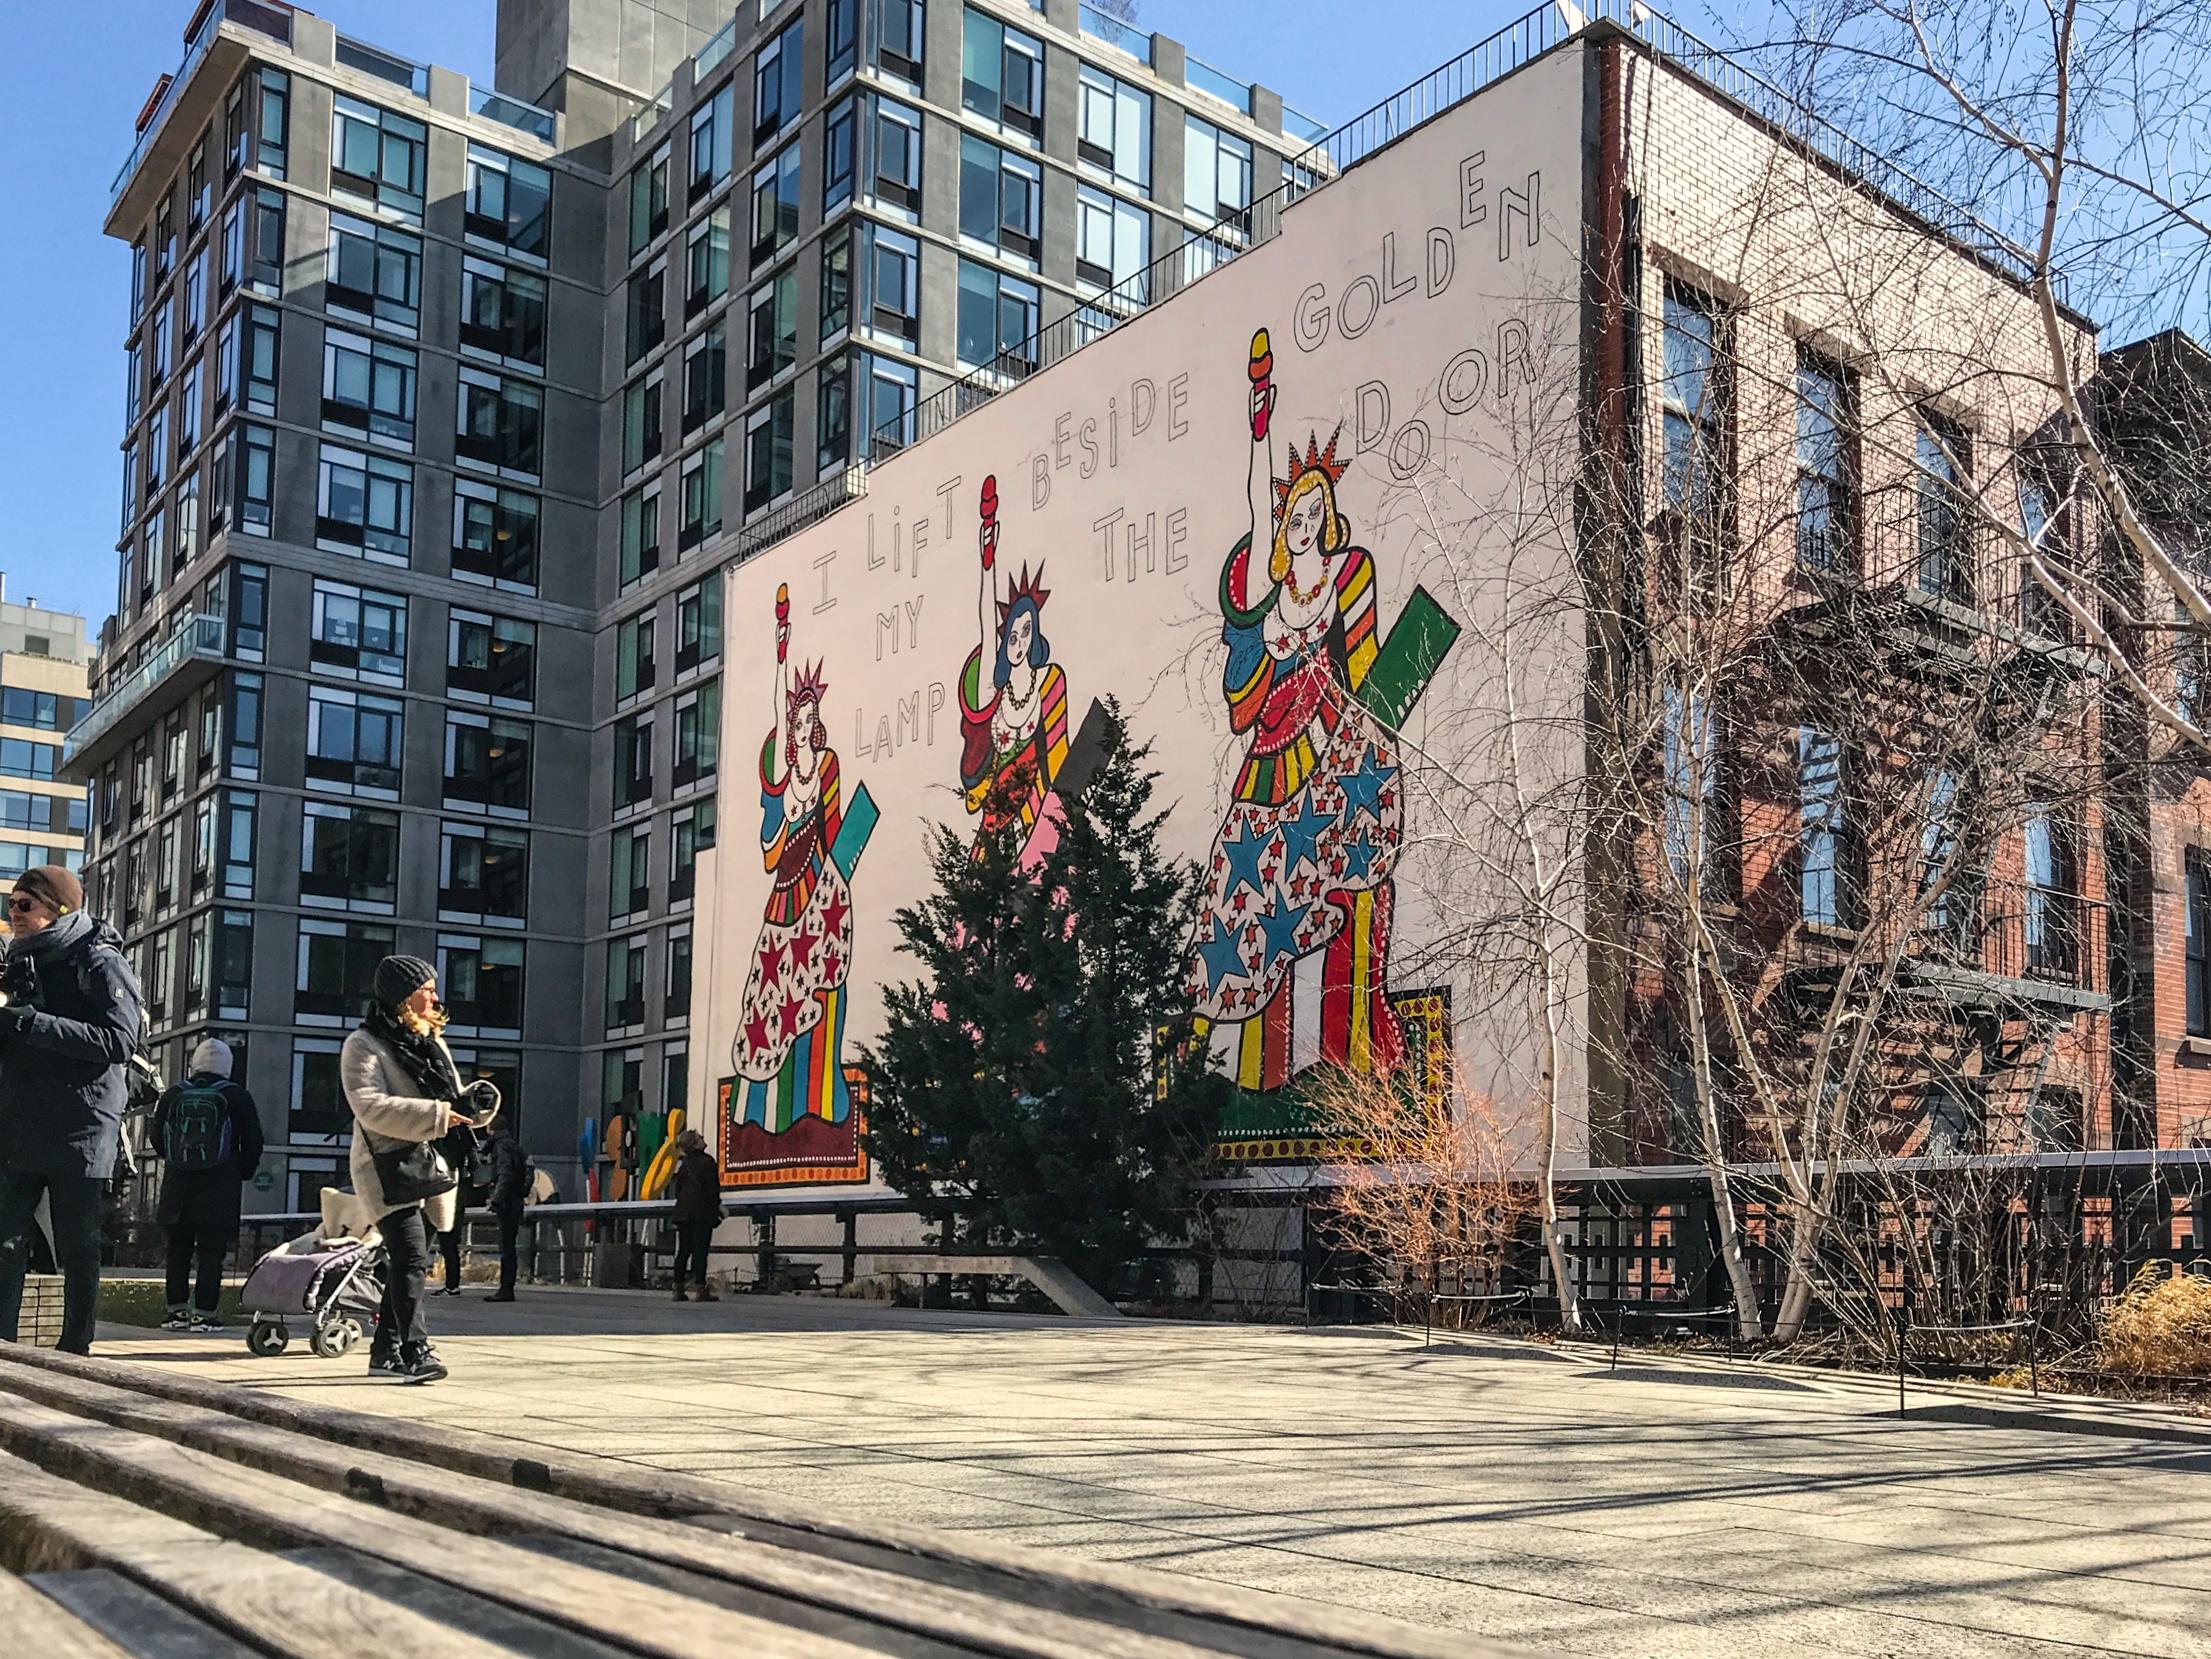 @ @ Mural of Statue of Liberty__High Line_3.17.18.jpg